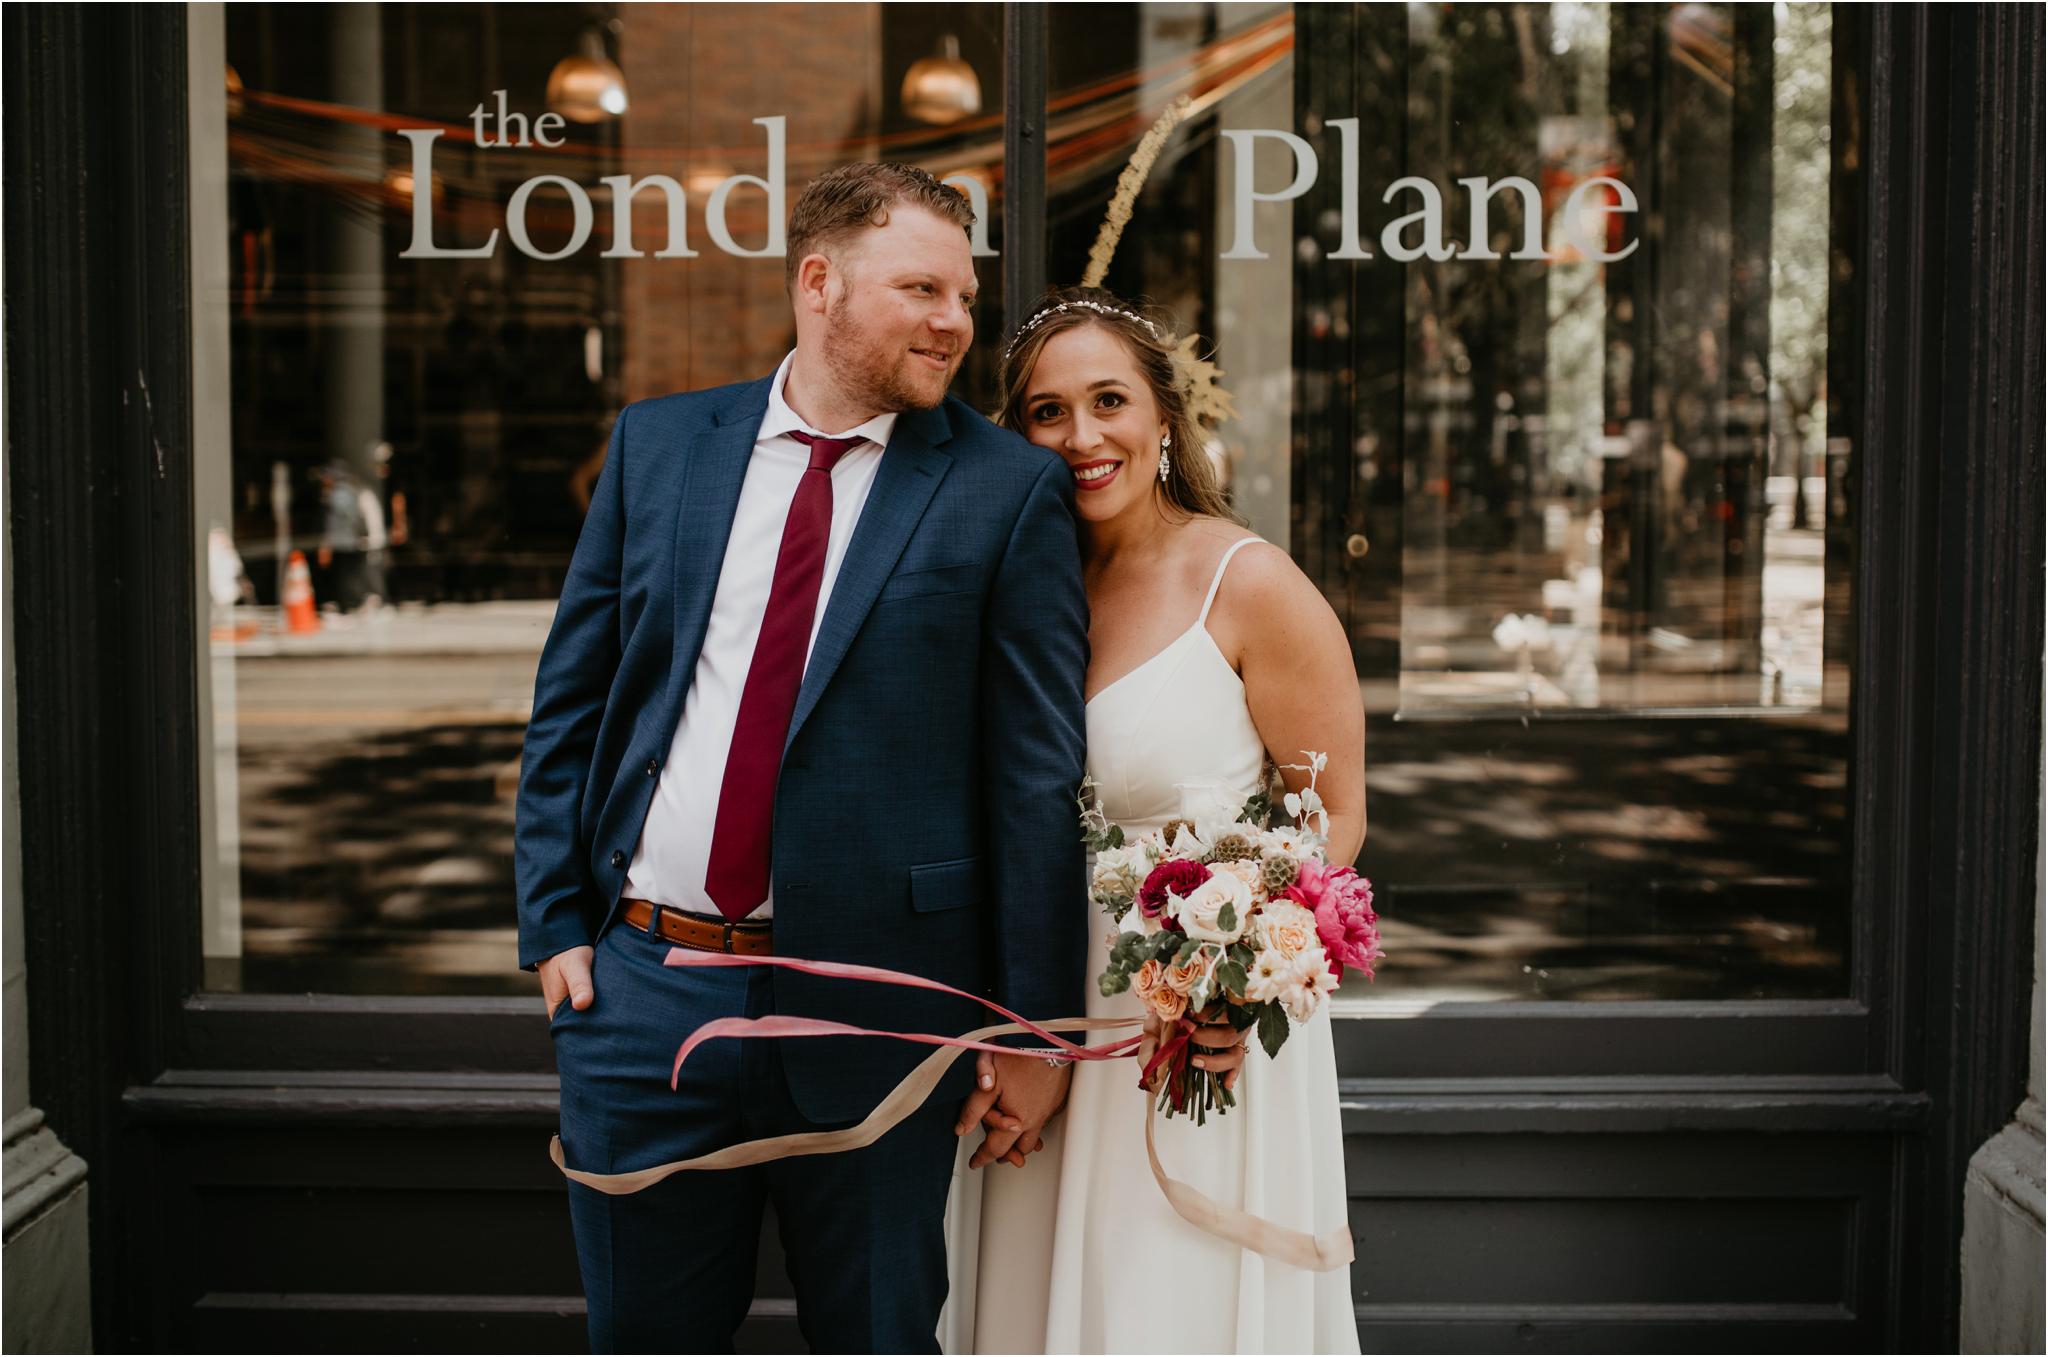 laura-and-matt-metropolist-urban-seattle-wedding-photographer-061.jpg